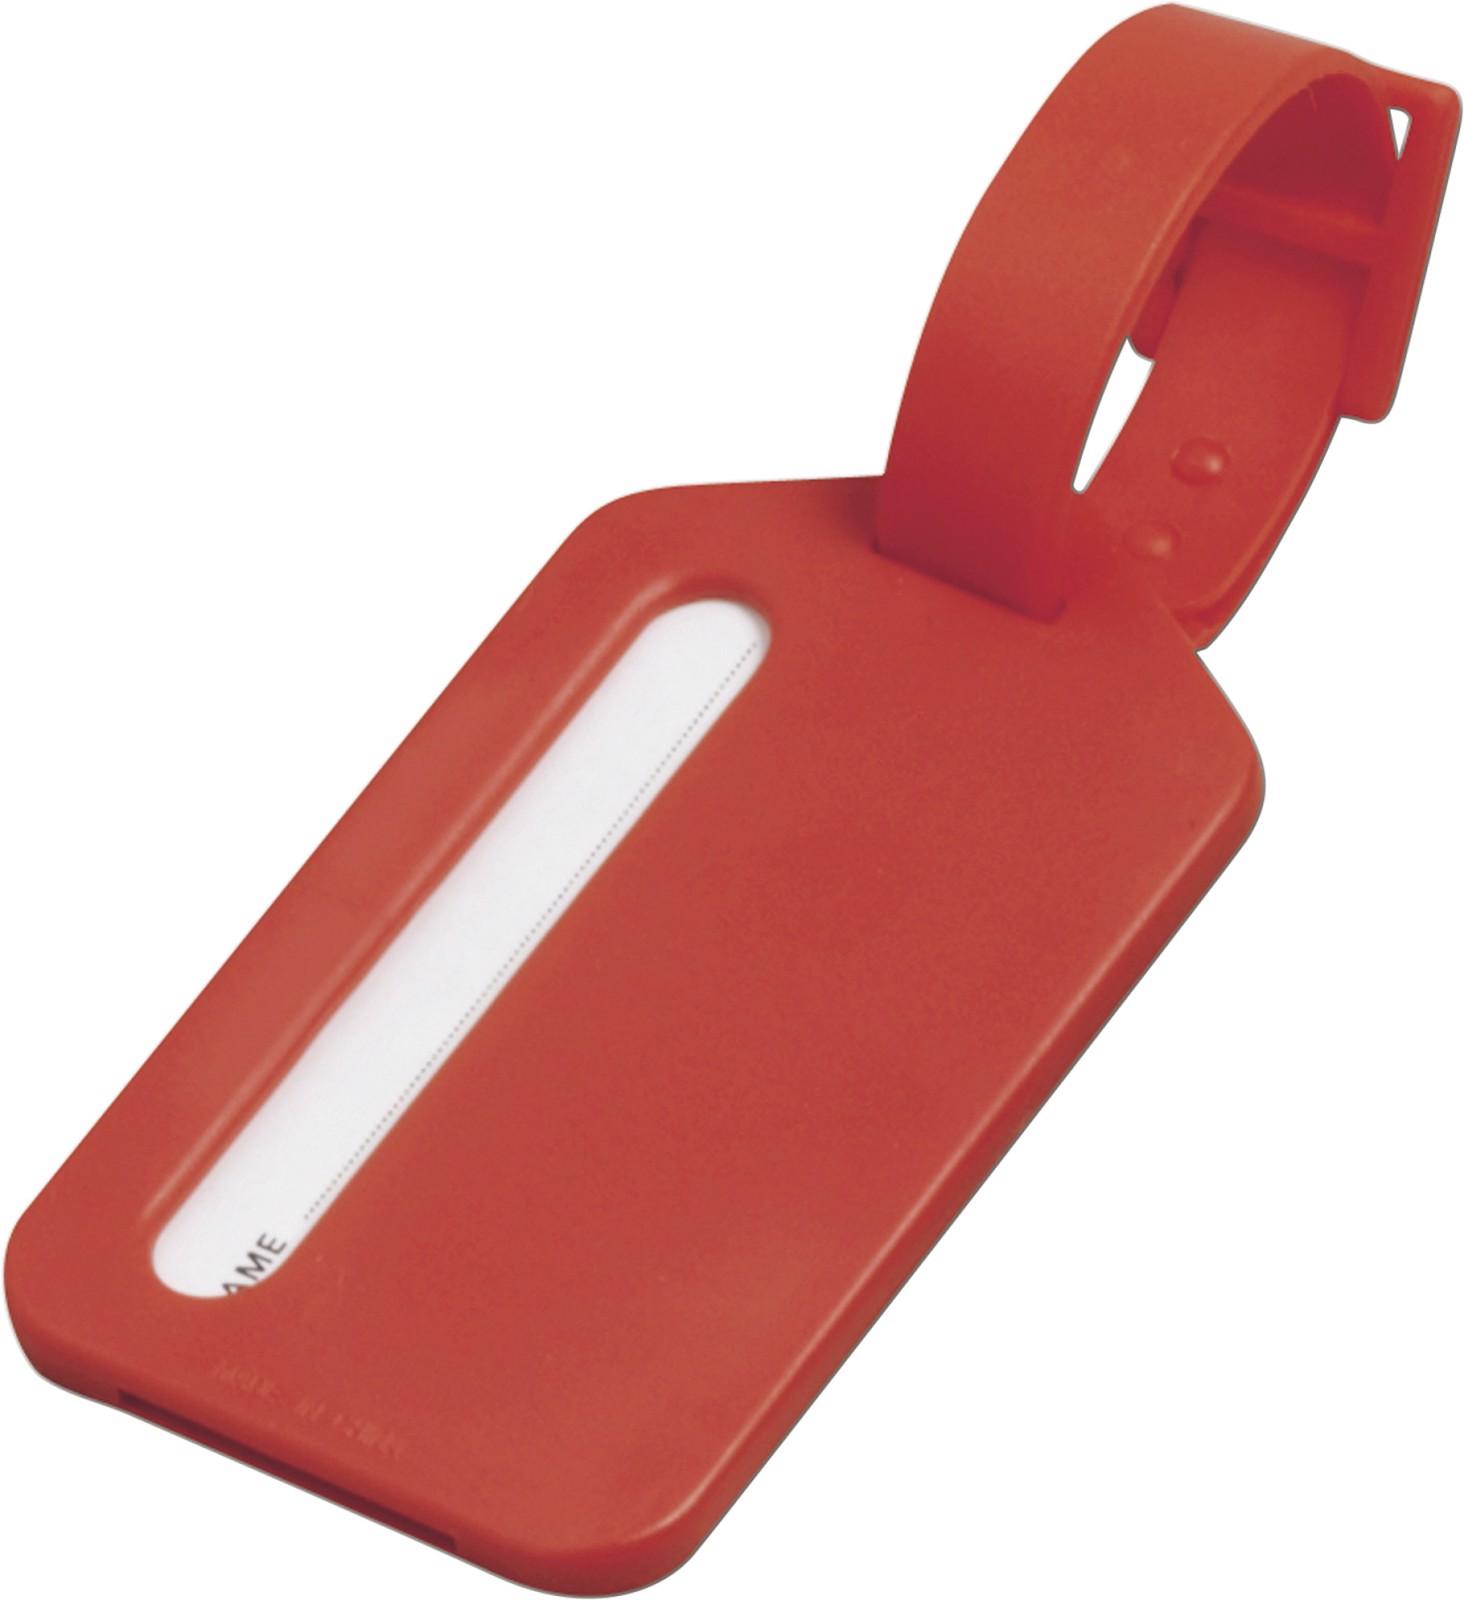 Polystyrene luggage tag - Red